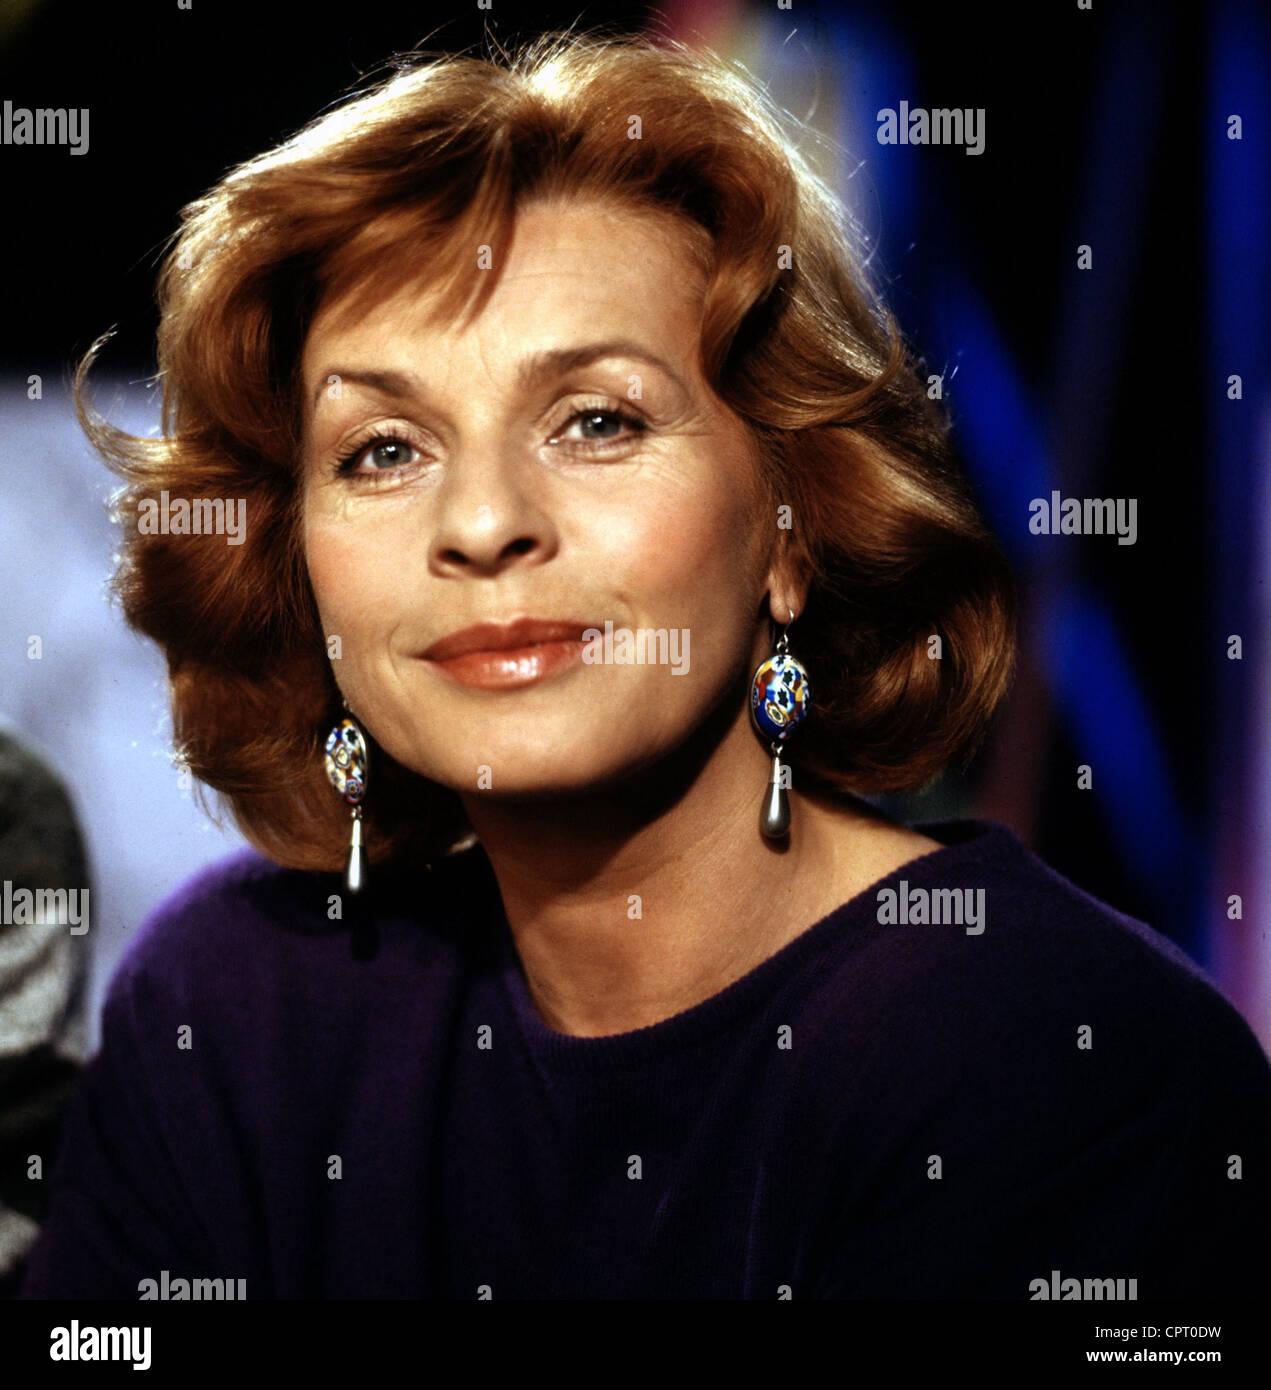 Berger, Senta, * 13.5.1941, Austrian actress, portrait, 1989, Stock Photo